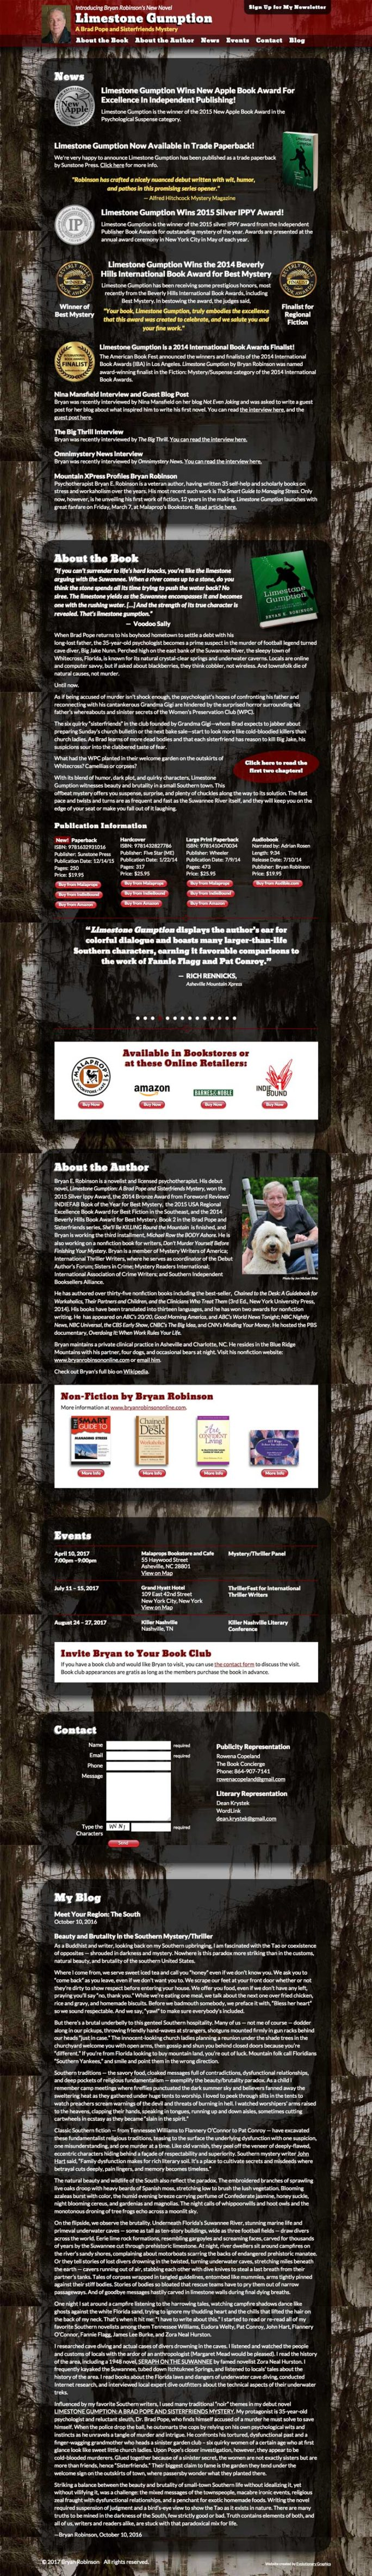 Brnovels Website Design Notebook